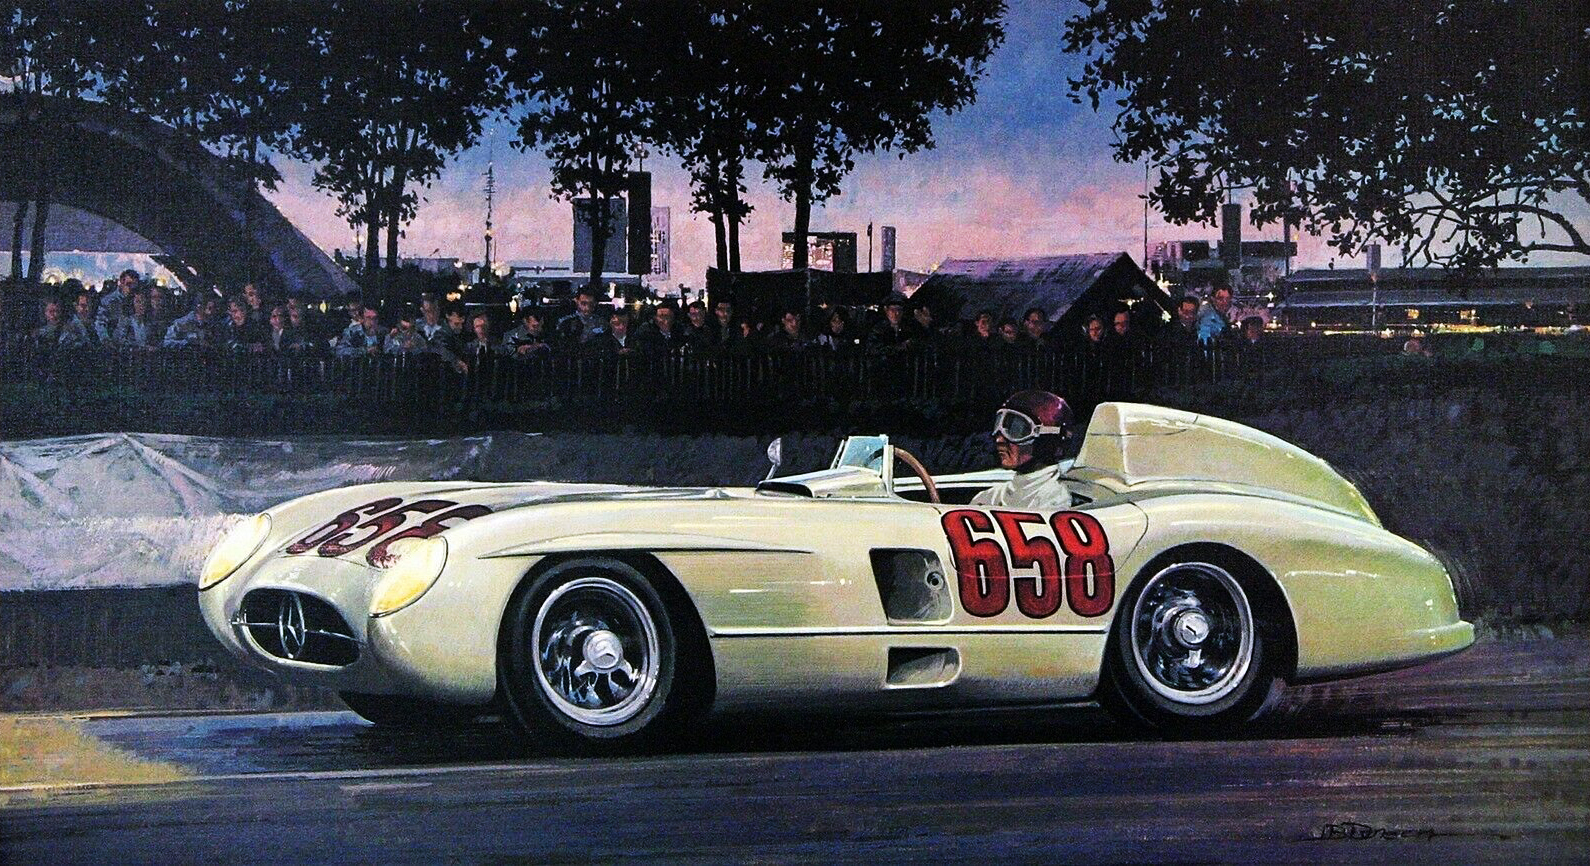 1955. Mercedes-Benz 300 SLR. Illustrated by James B. Deneen